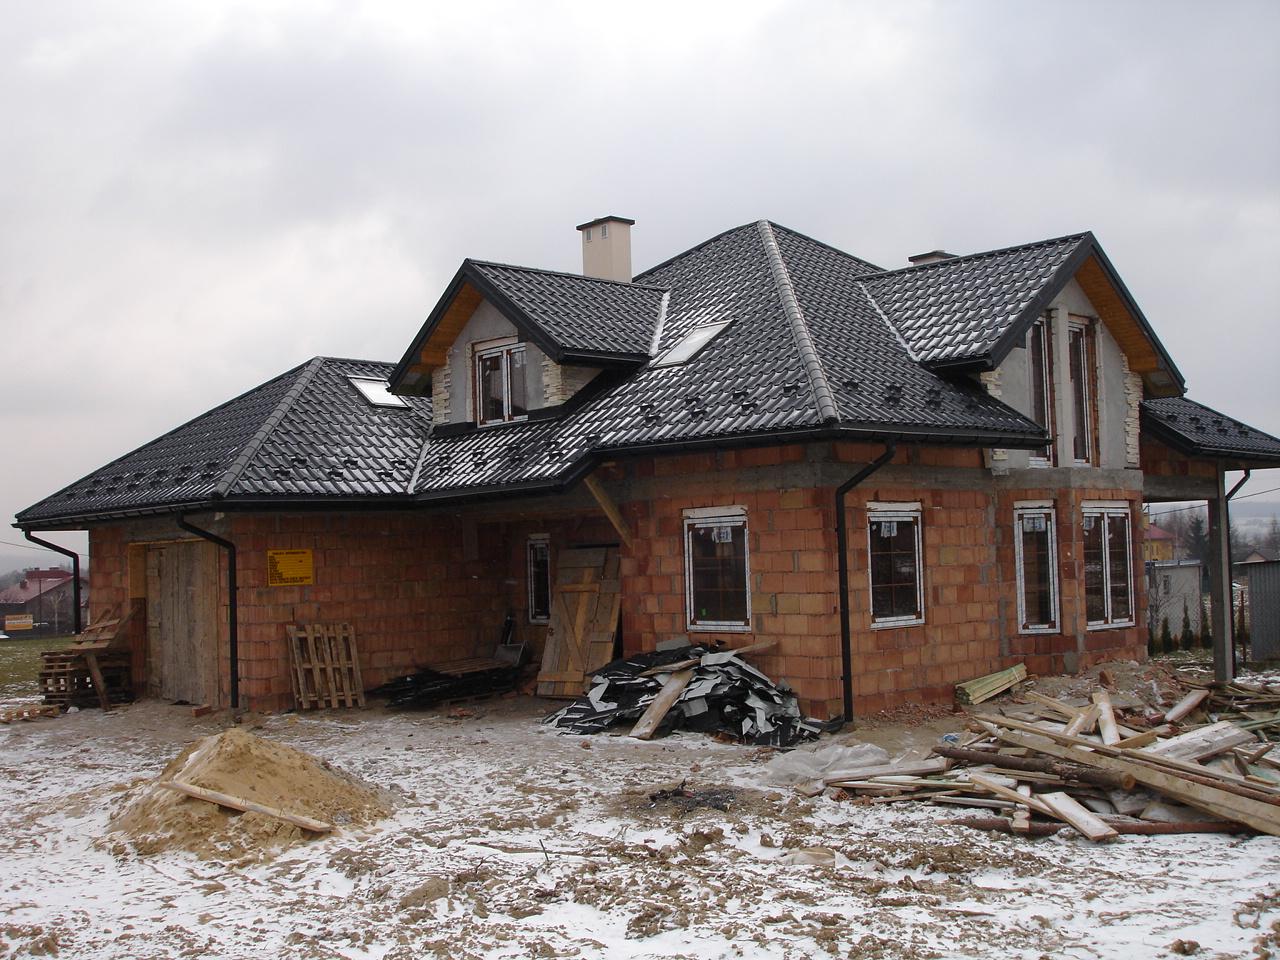 Proyectos de casas casa r stica proyectosdecasas - Proyectos de casas rusticas ...